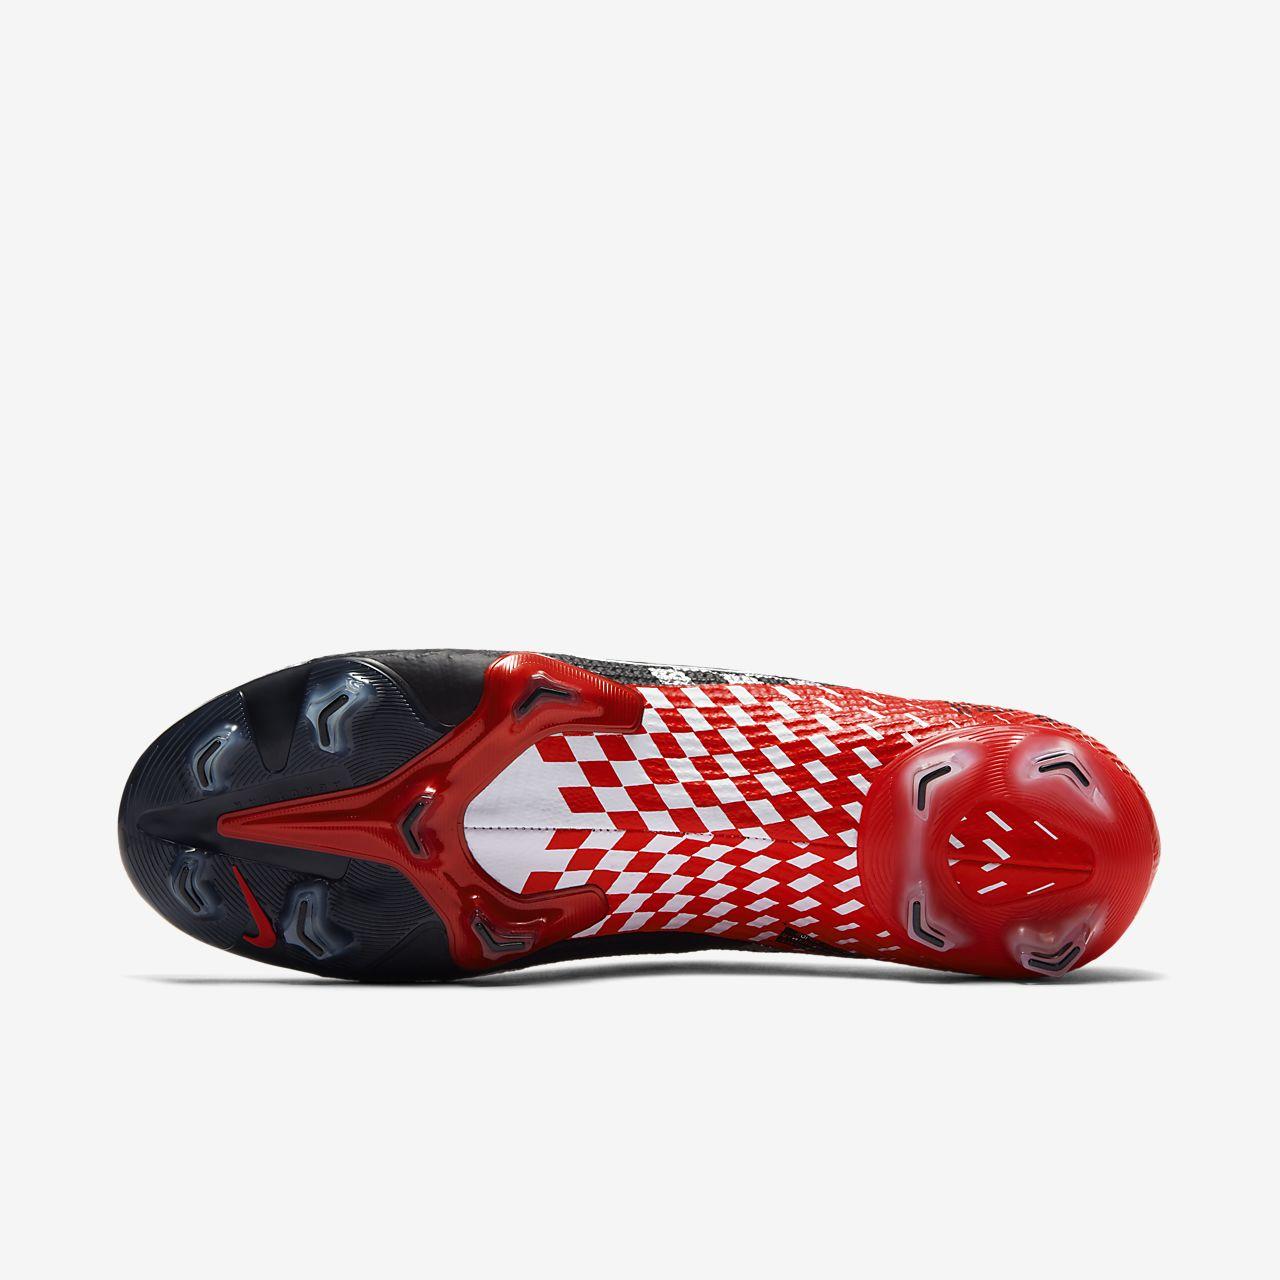 Mercurial Pour Terrain Sec Chaussure JrFg Neymar 13 Nike Vapor Elite Crampons Football À De WeYb2I9EDH